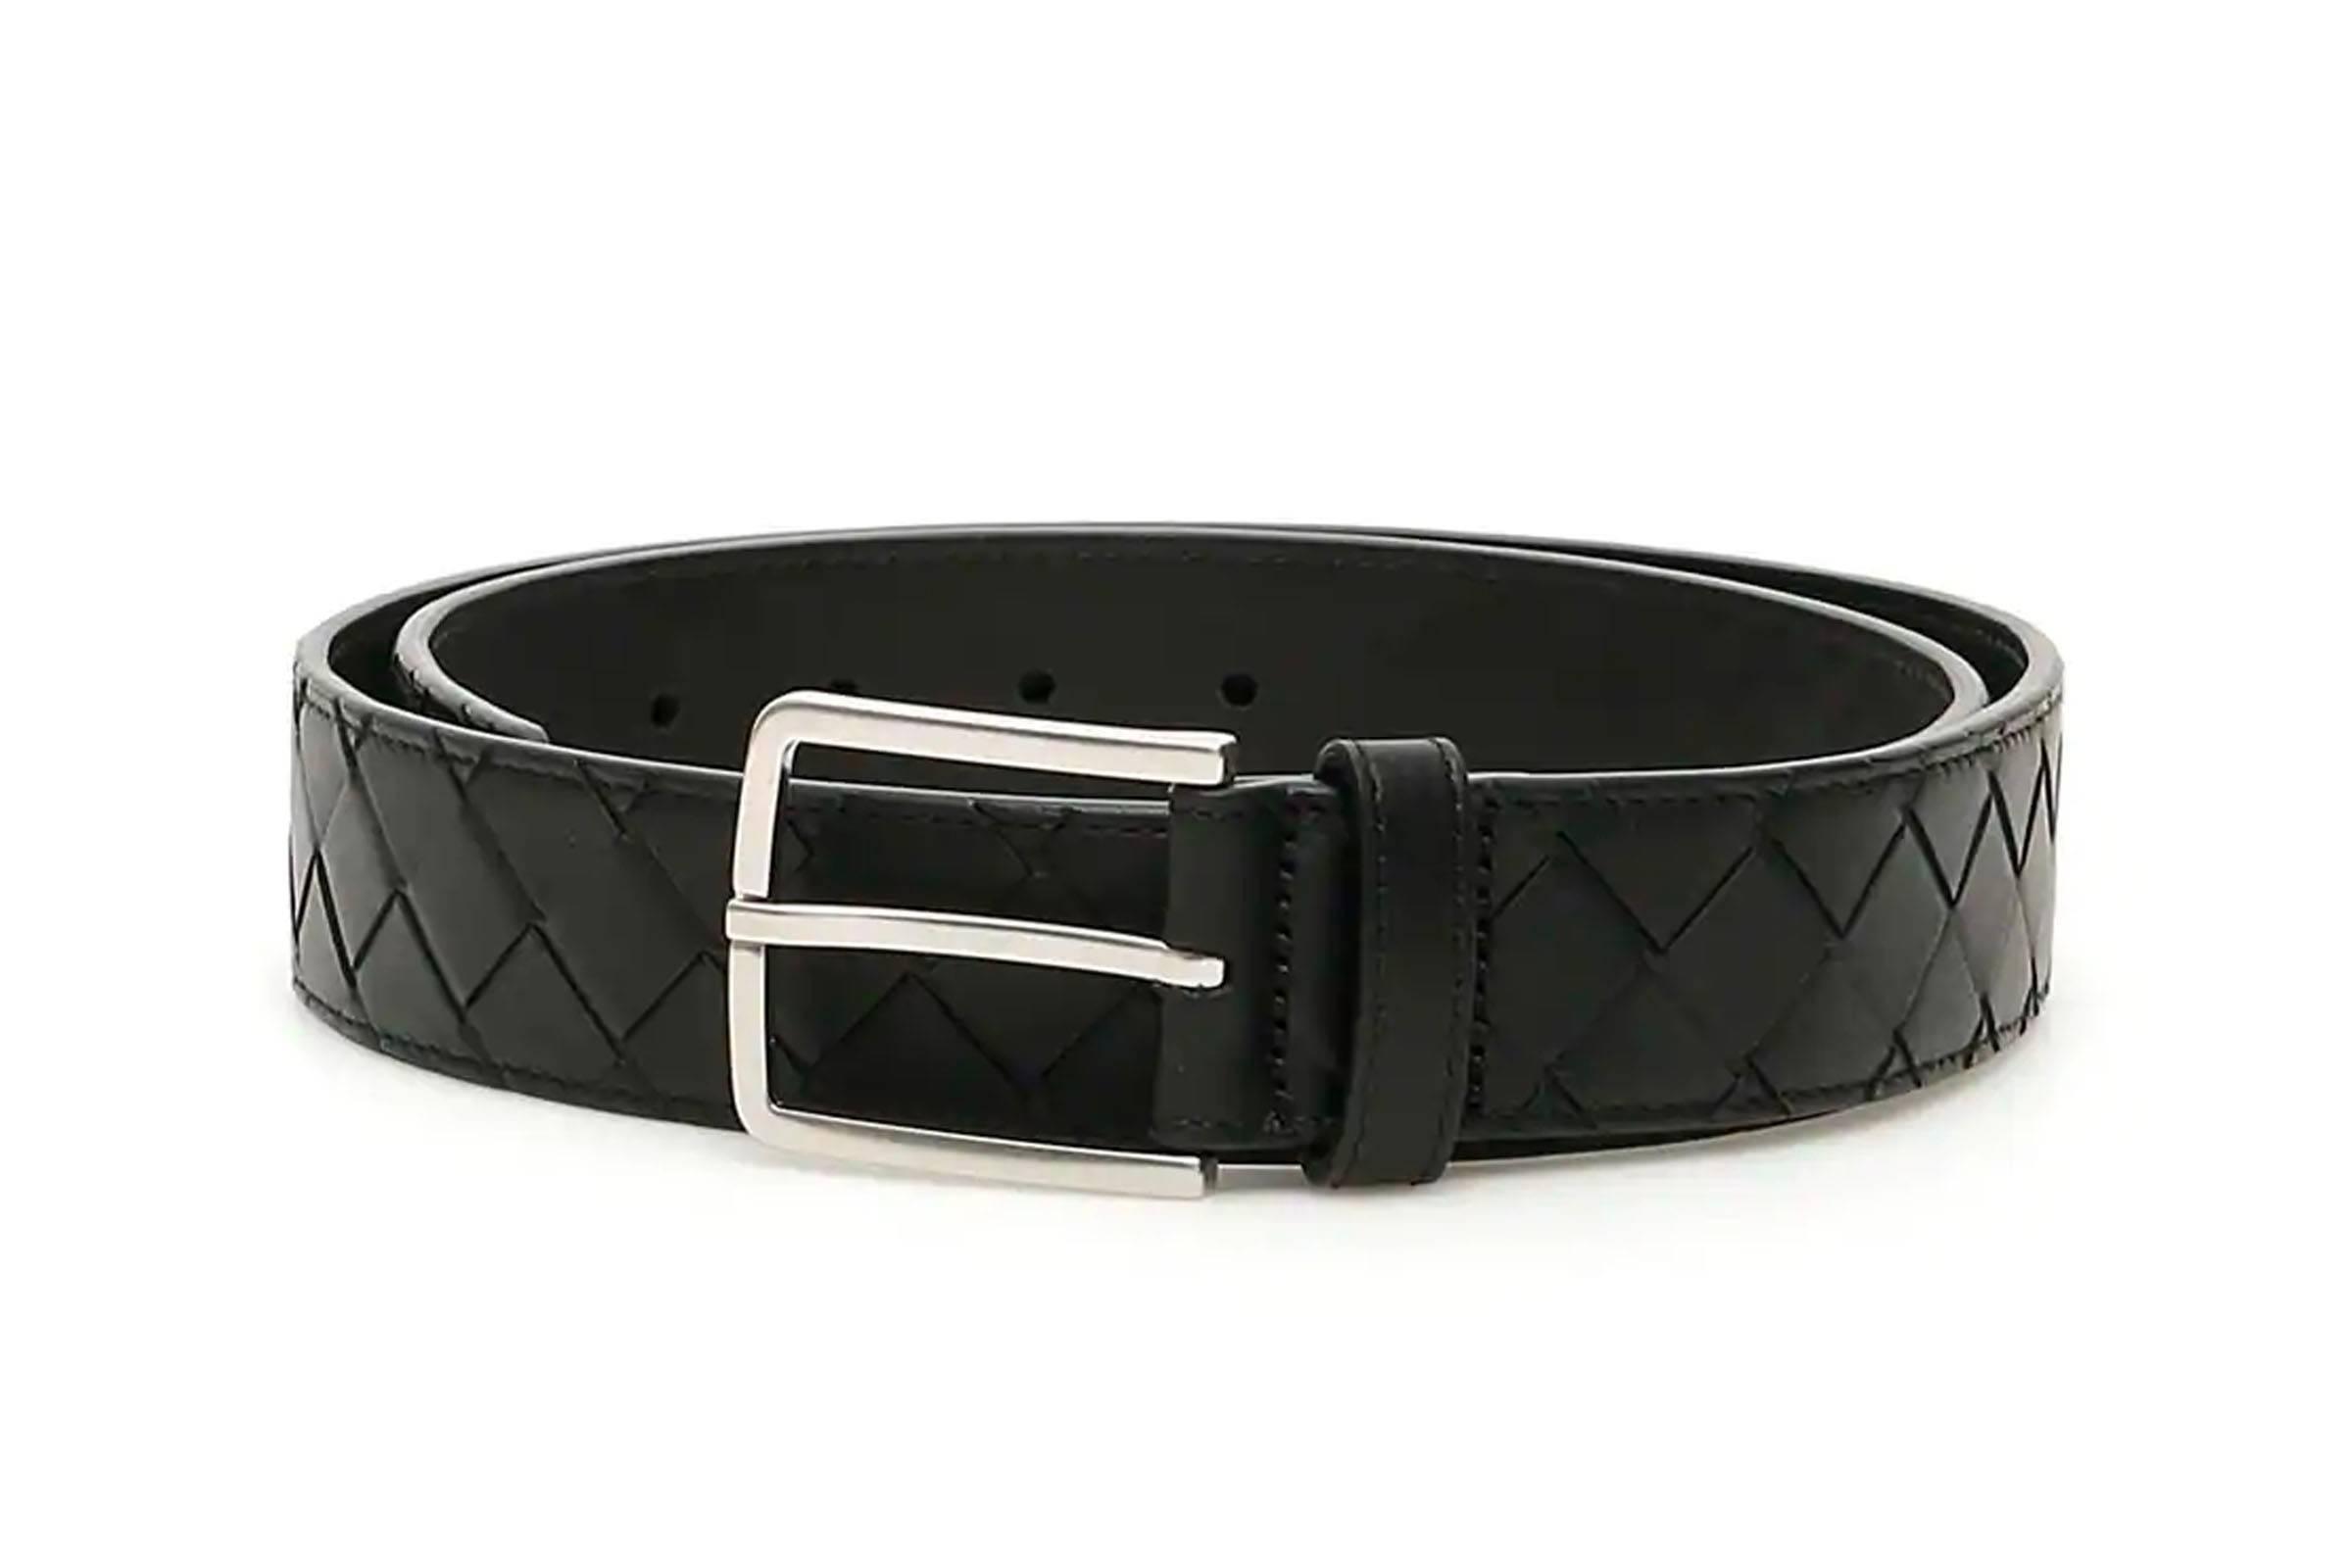 Bottega Veneta Black Intrecciato Belt